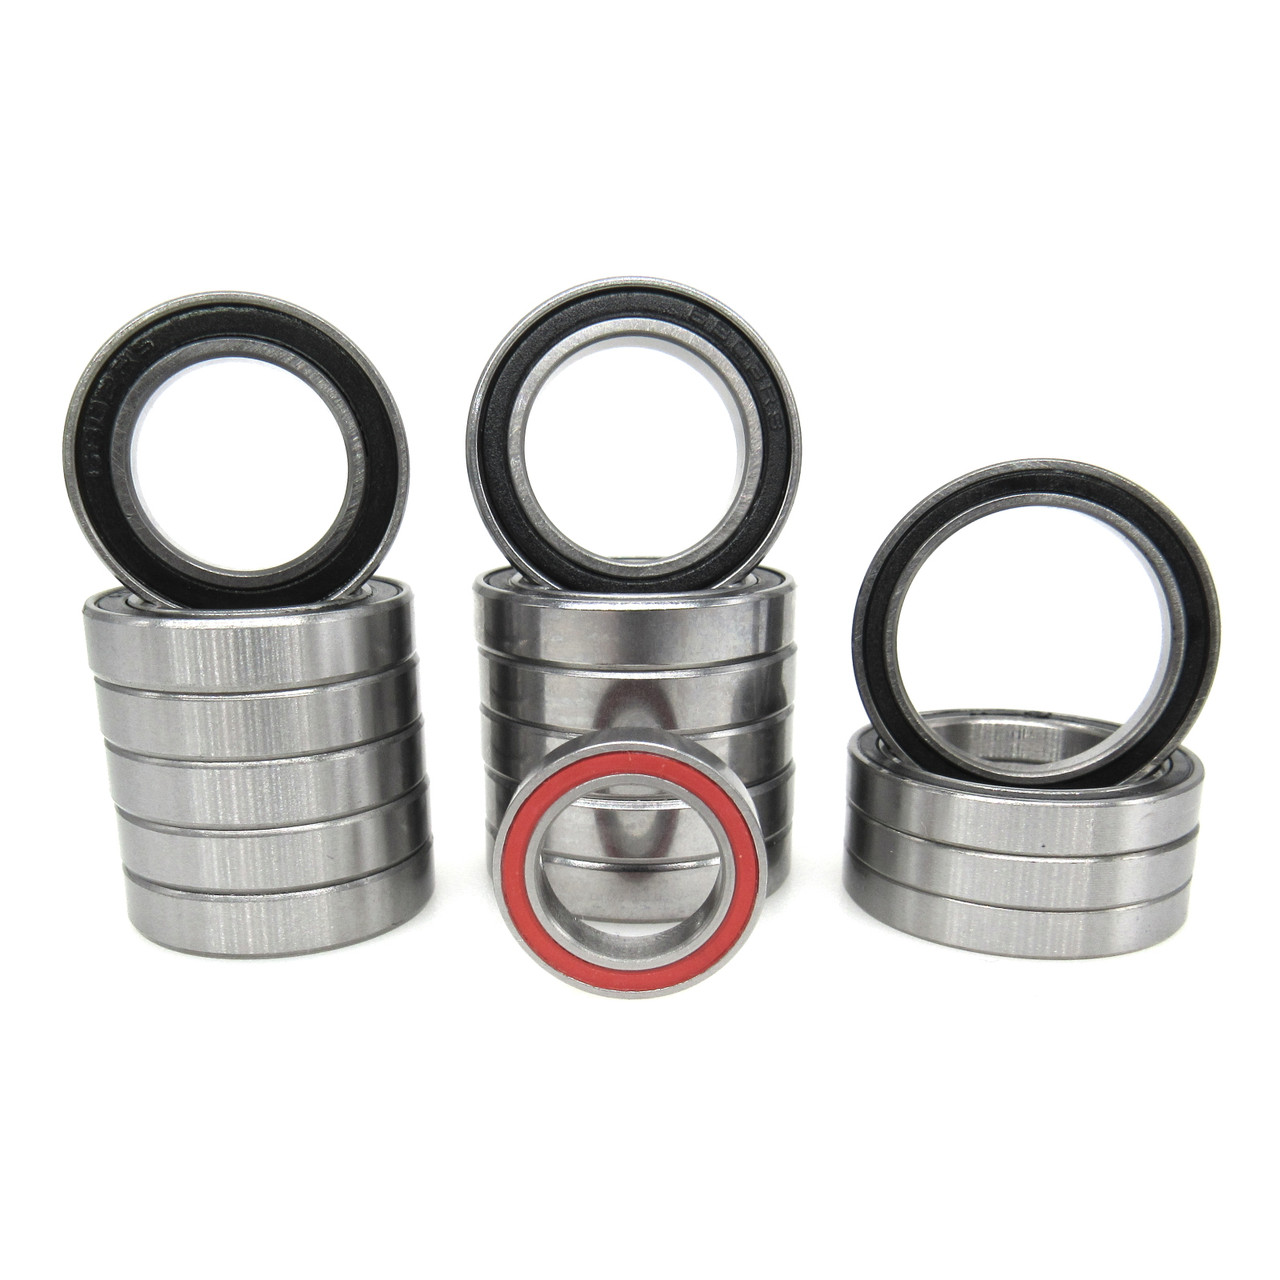 TRB RC Ceramic Hub-Diff-CTR Bearings Kit (17) Traxxas X-MAXX